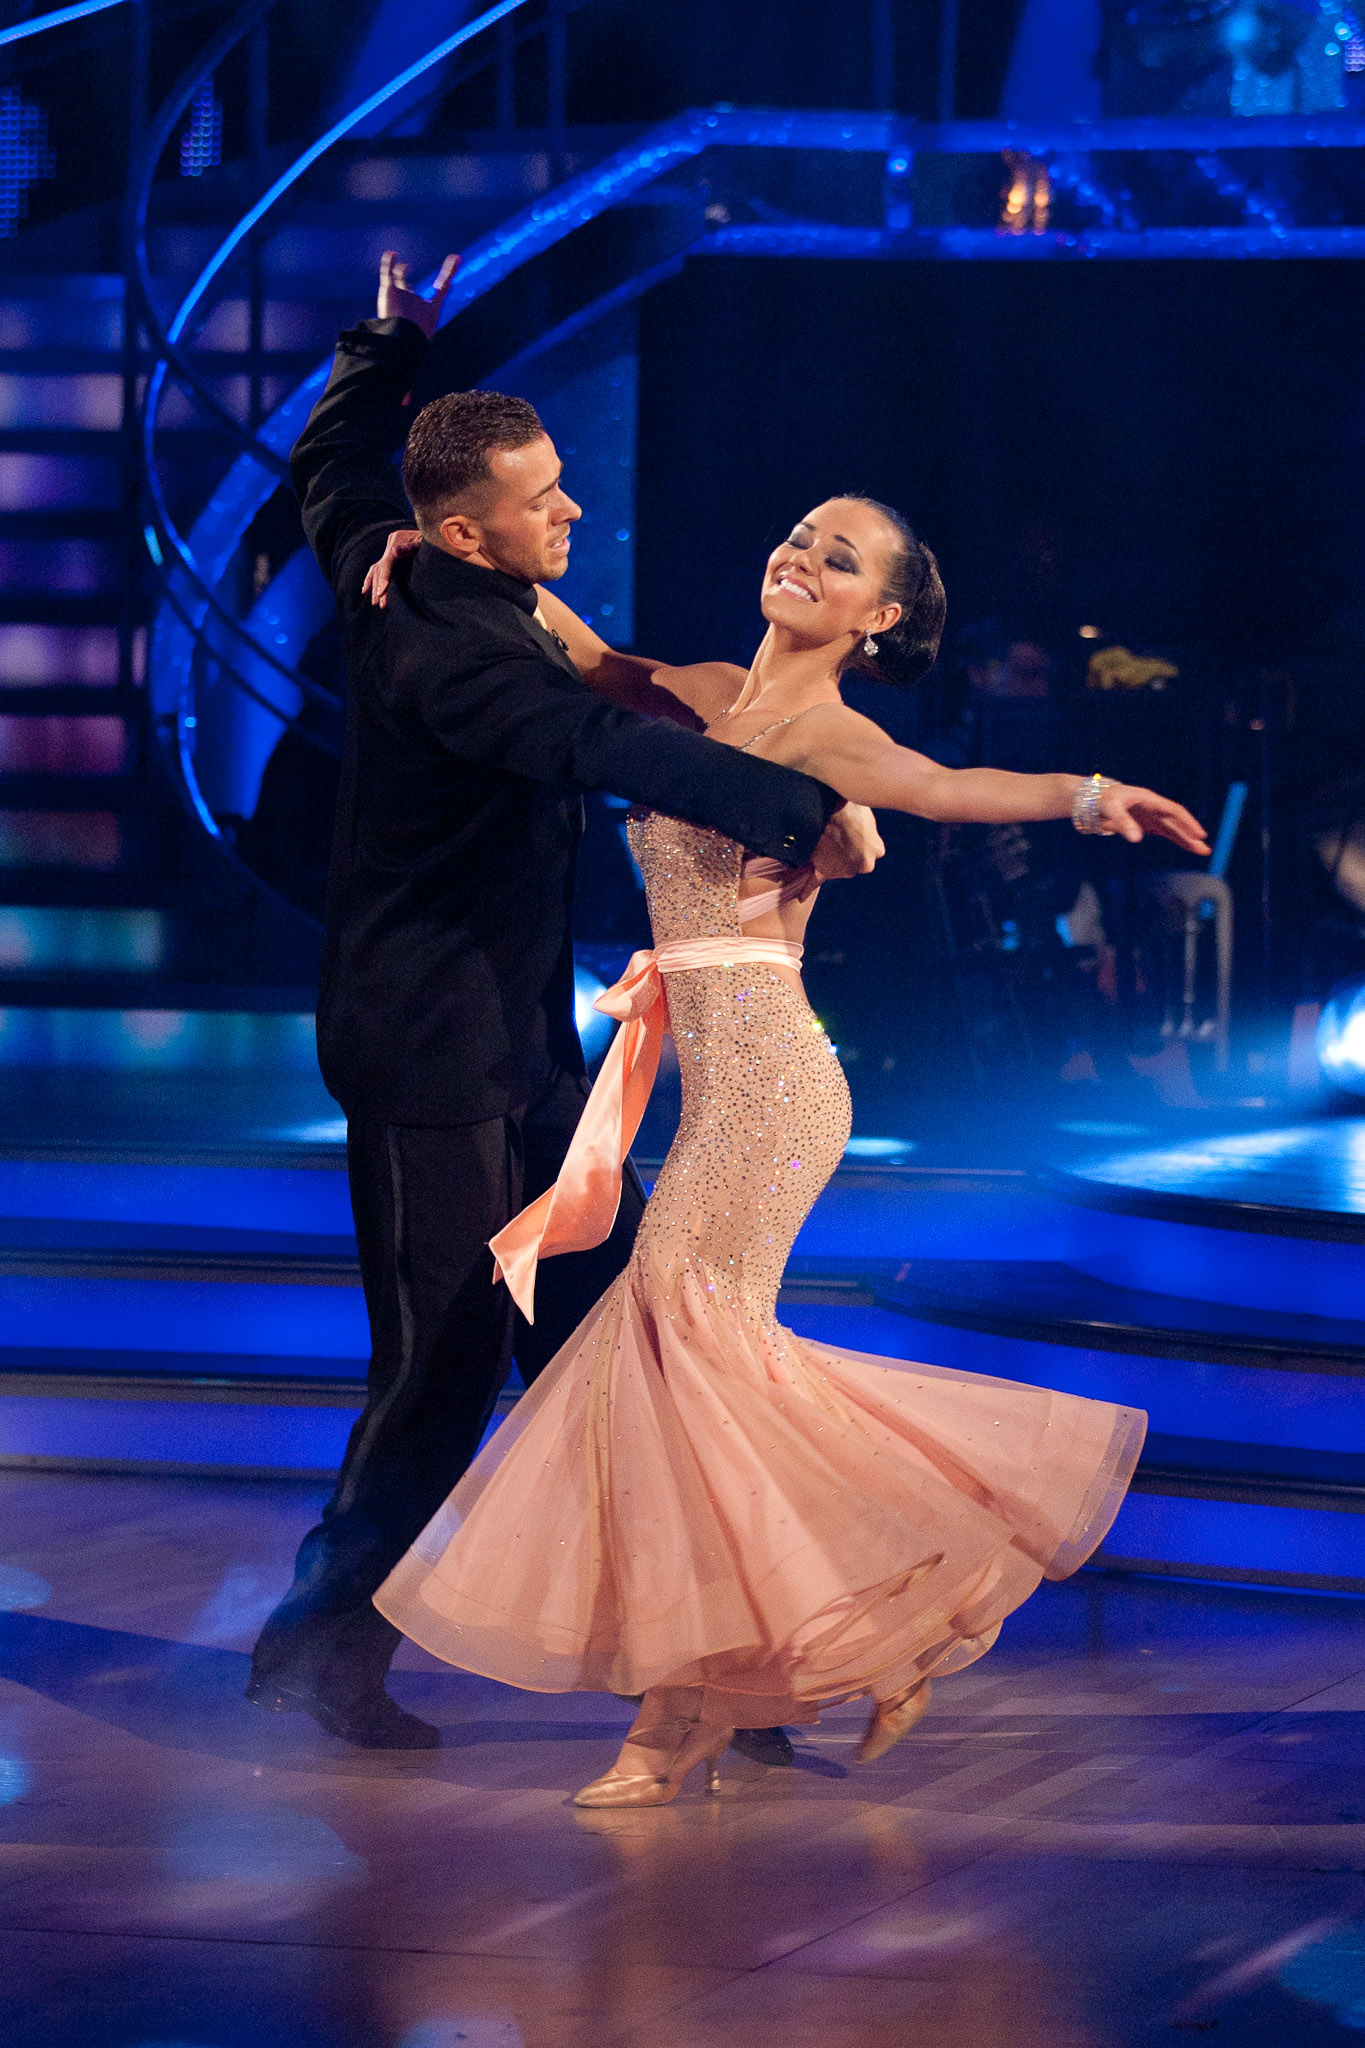 two dancers dance